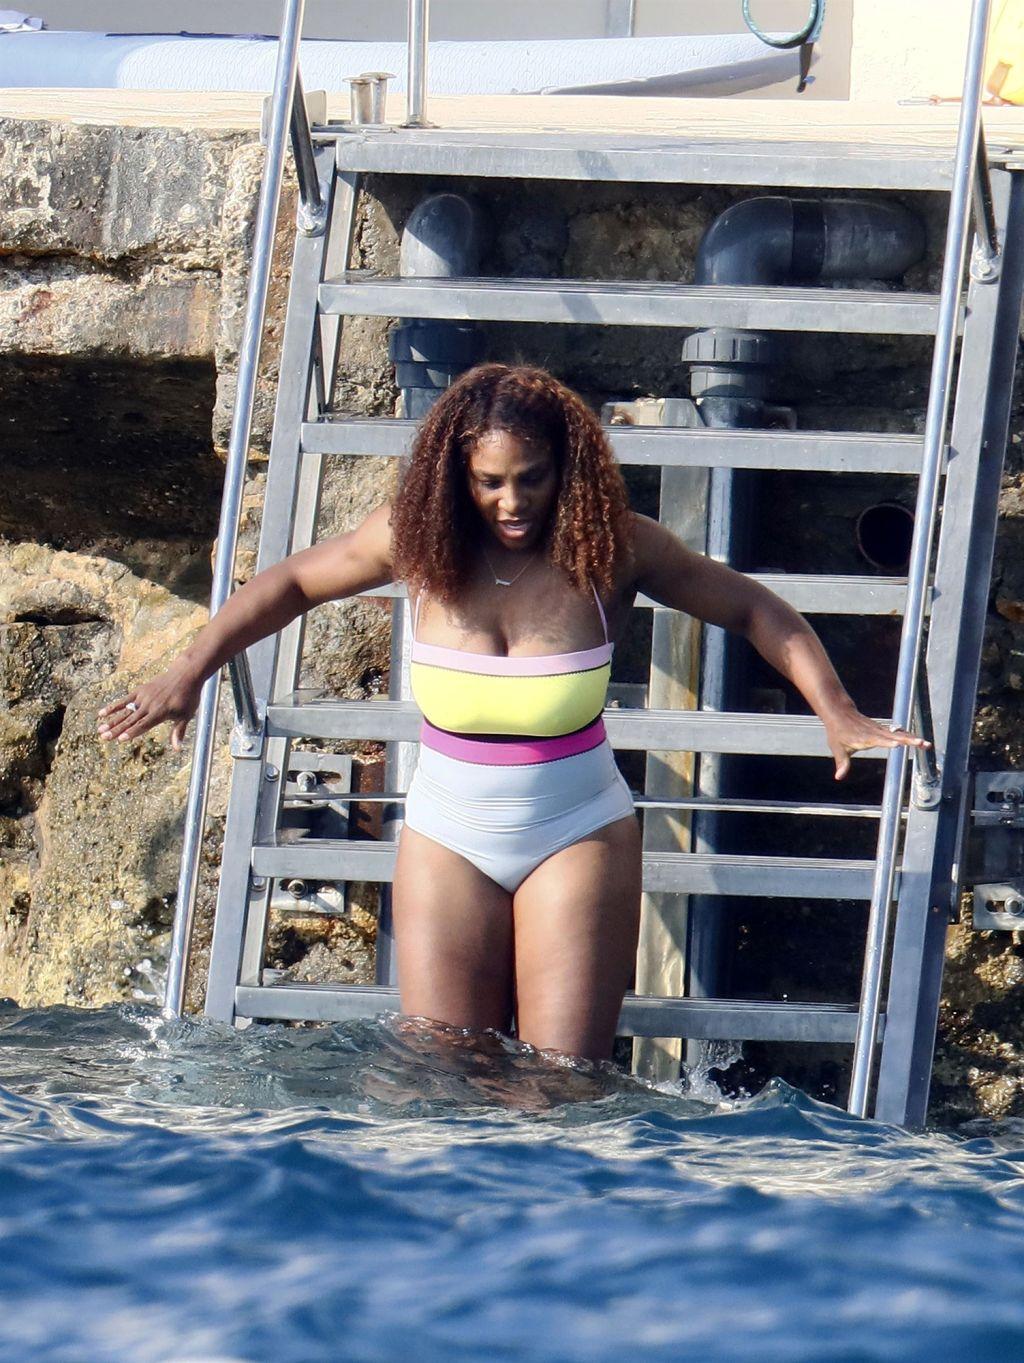 Serena Williams nu a putut sa stea departe de apa si a petrecut o mare parte din timp inotand. Sursa foto: Daily Mail